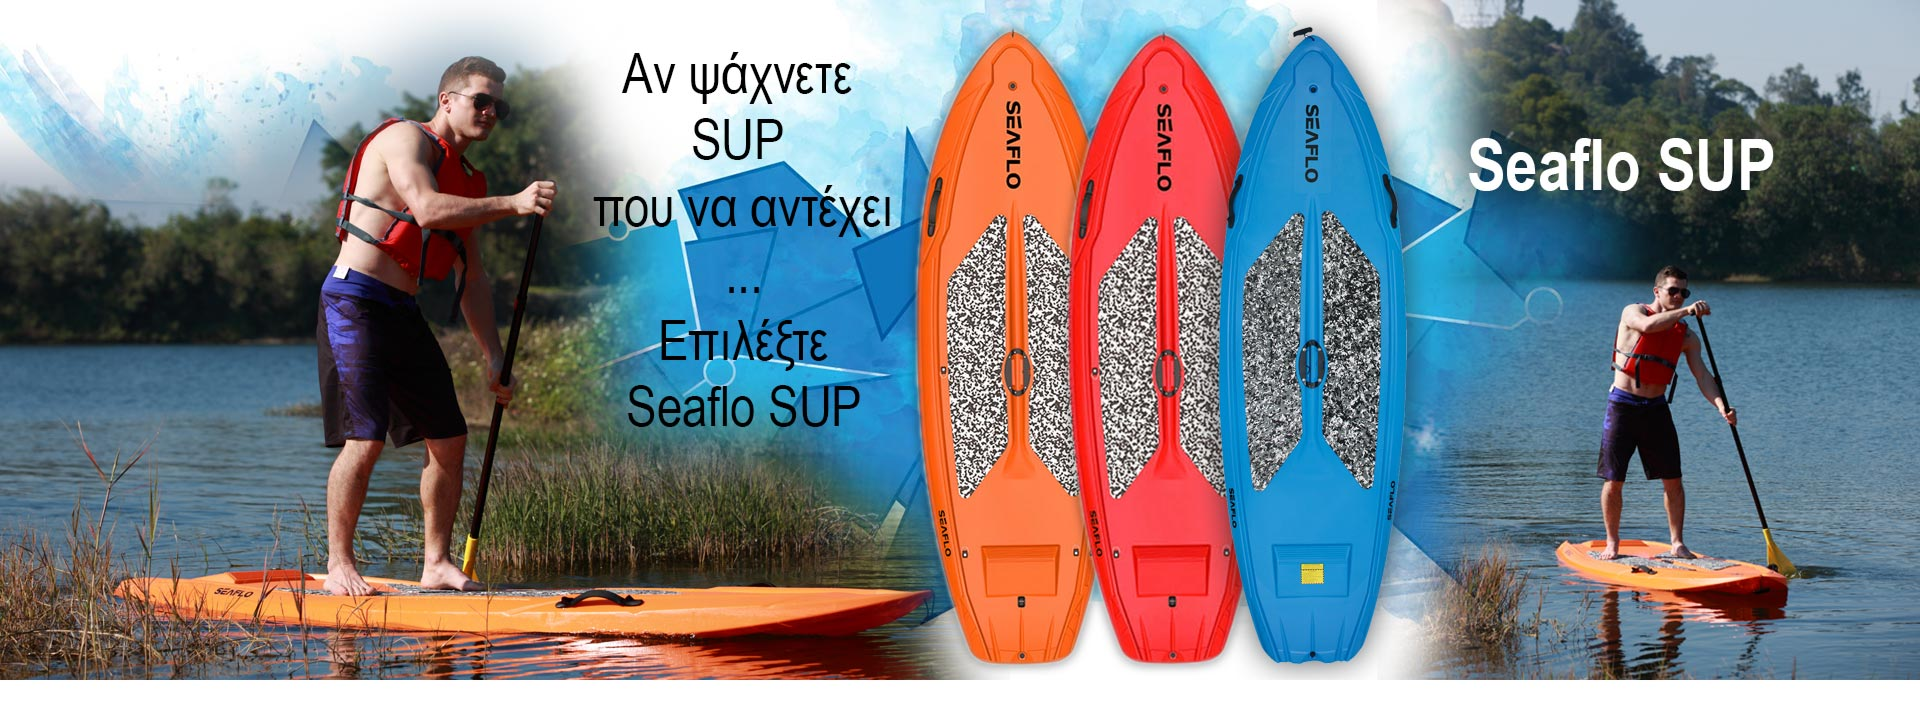 Seaflo_SUP_slide_New